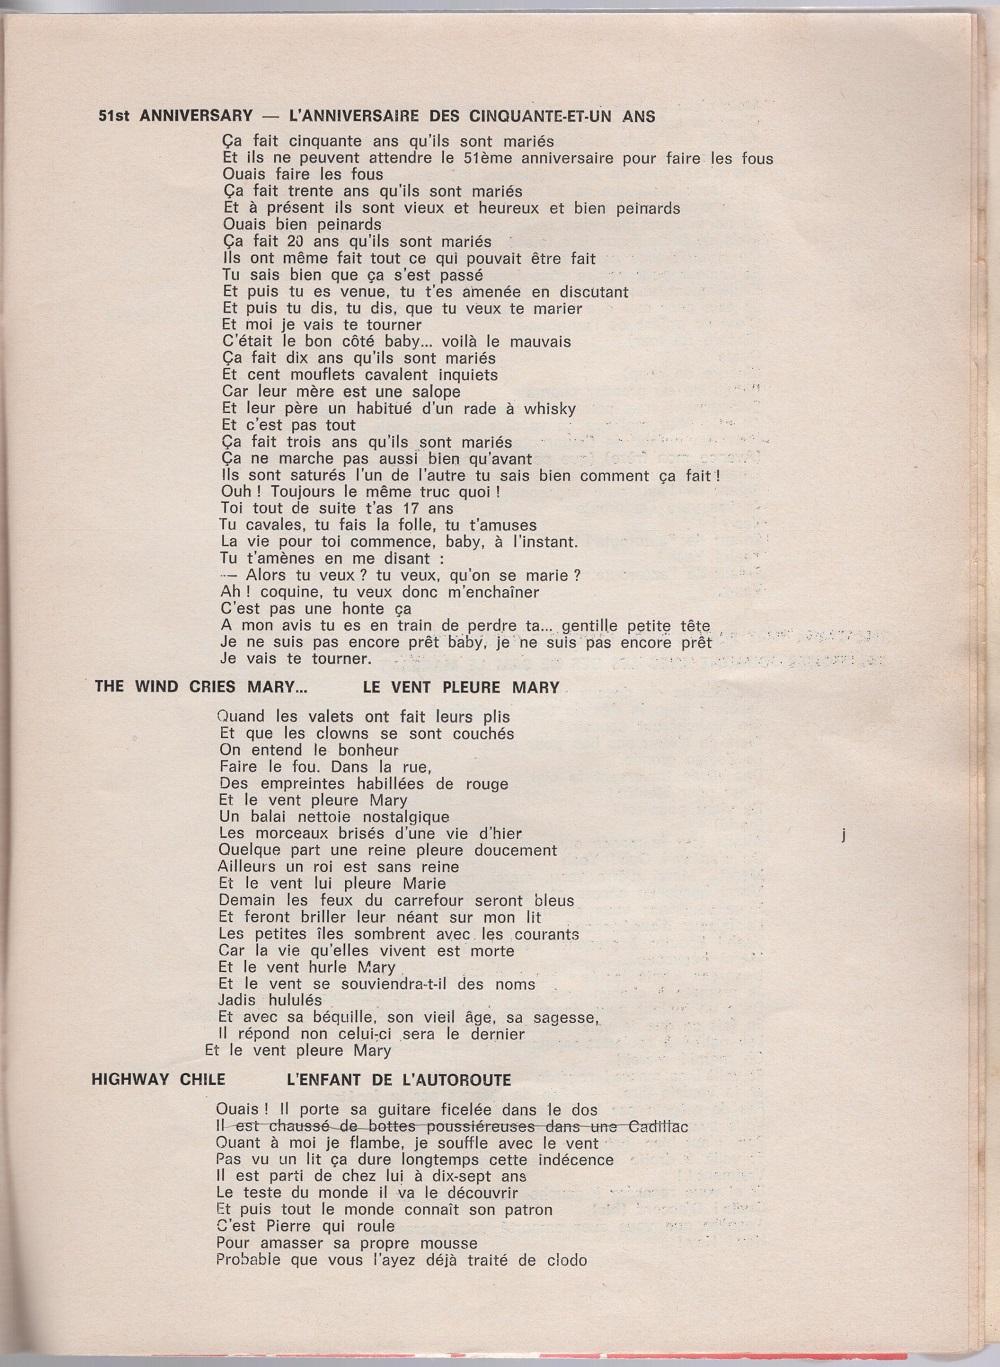 Curio Francais... Jimi Hendrix Songbook - Page 2 7410